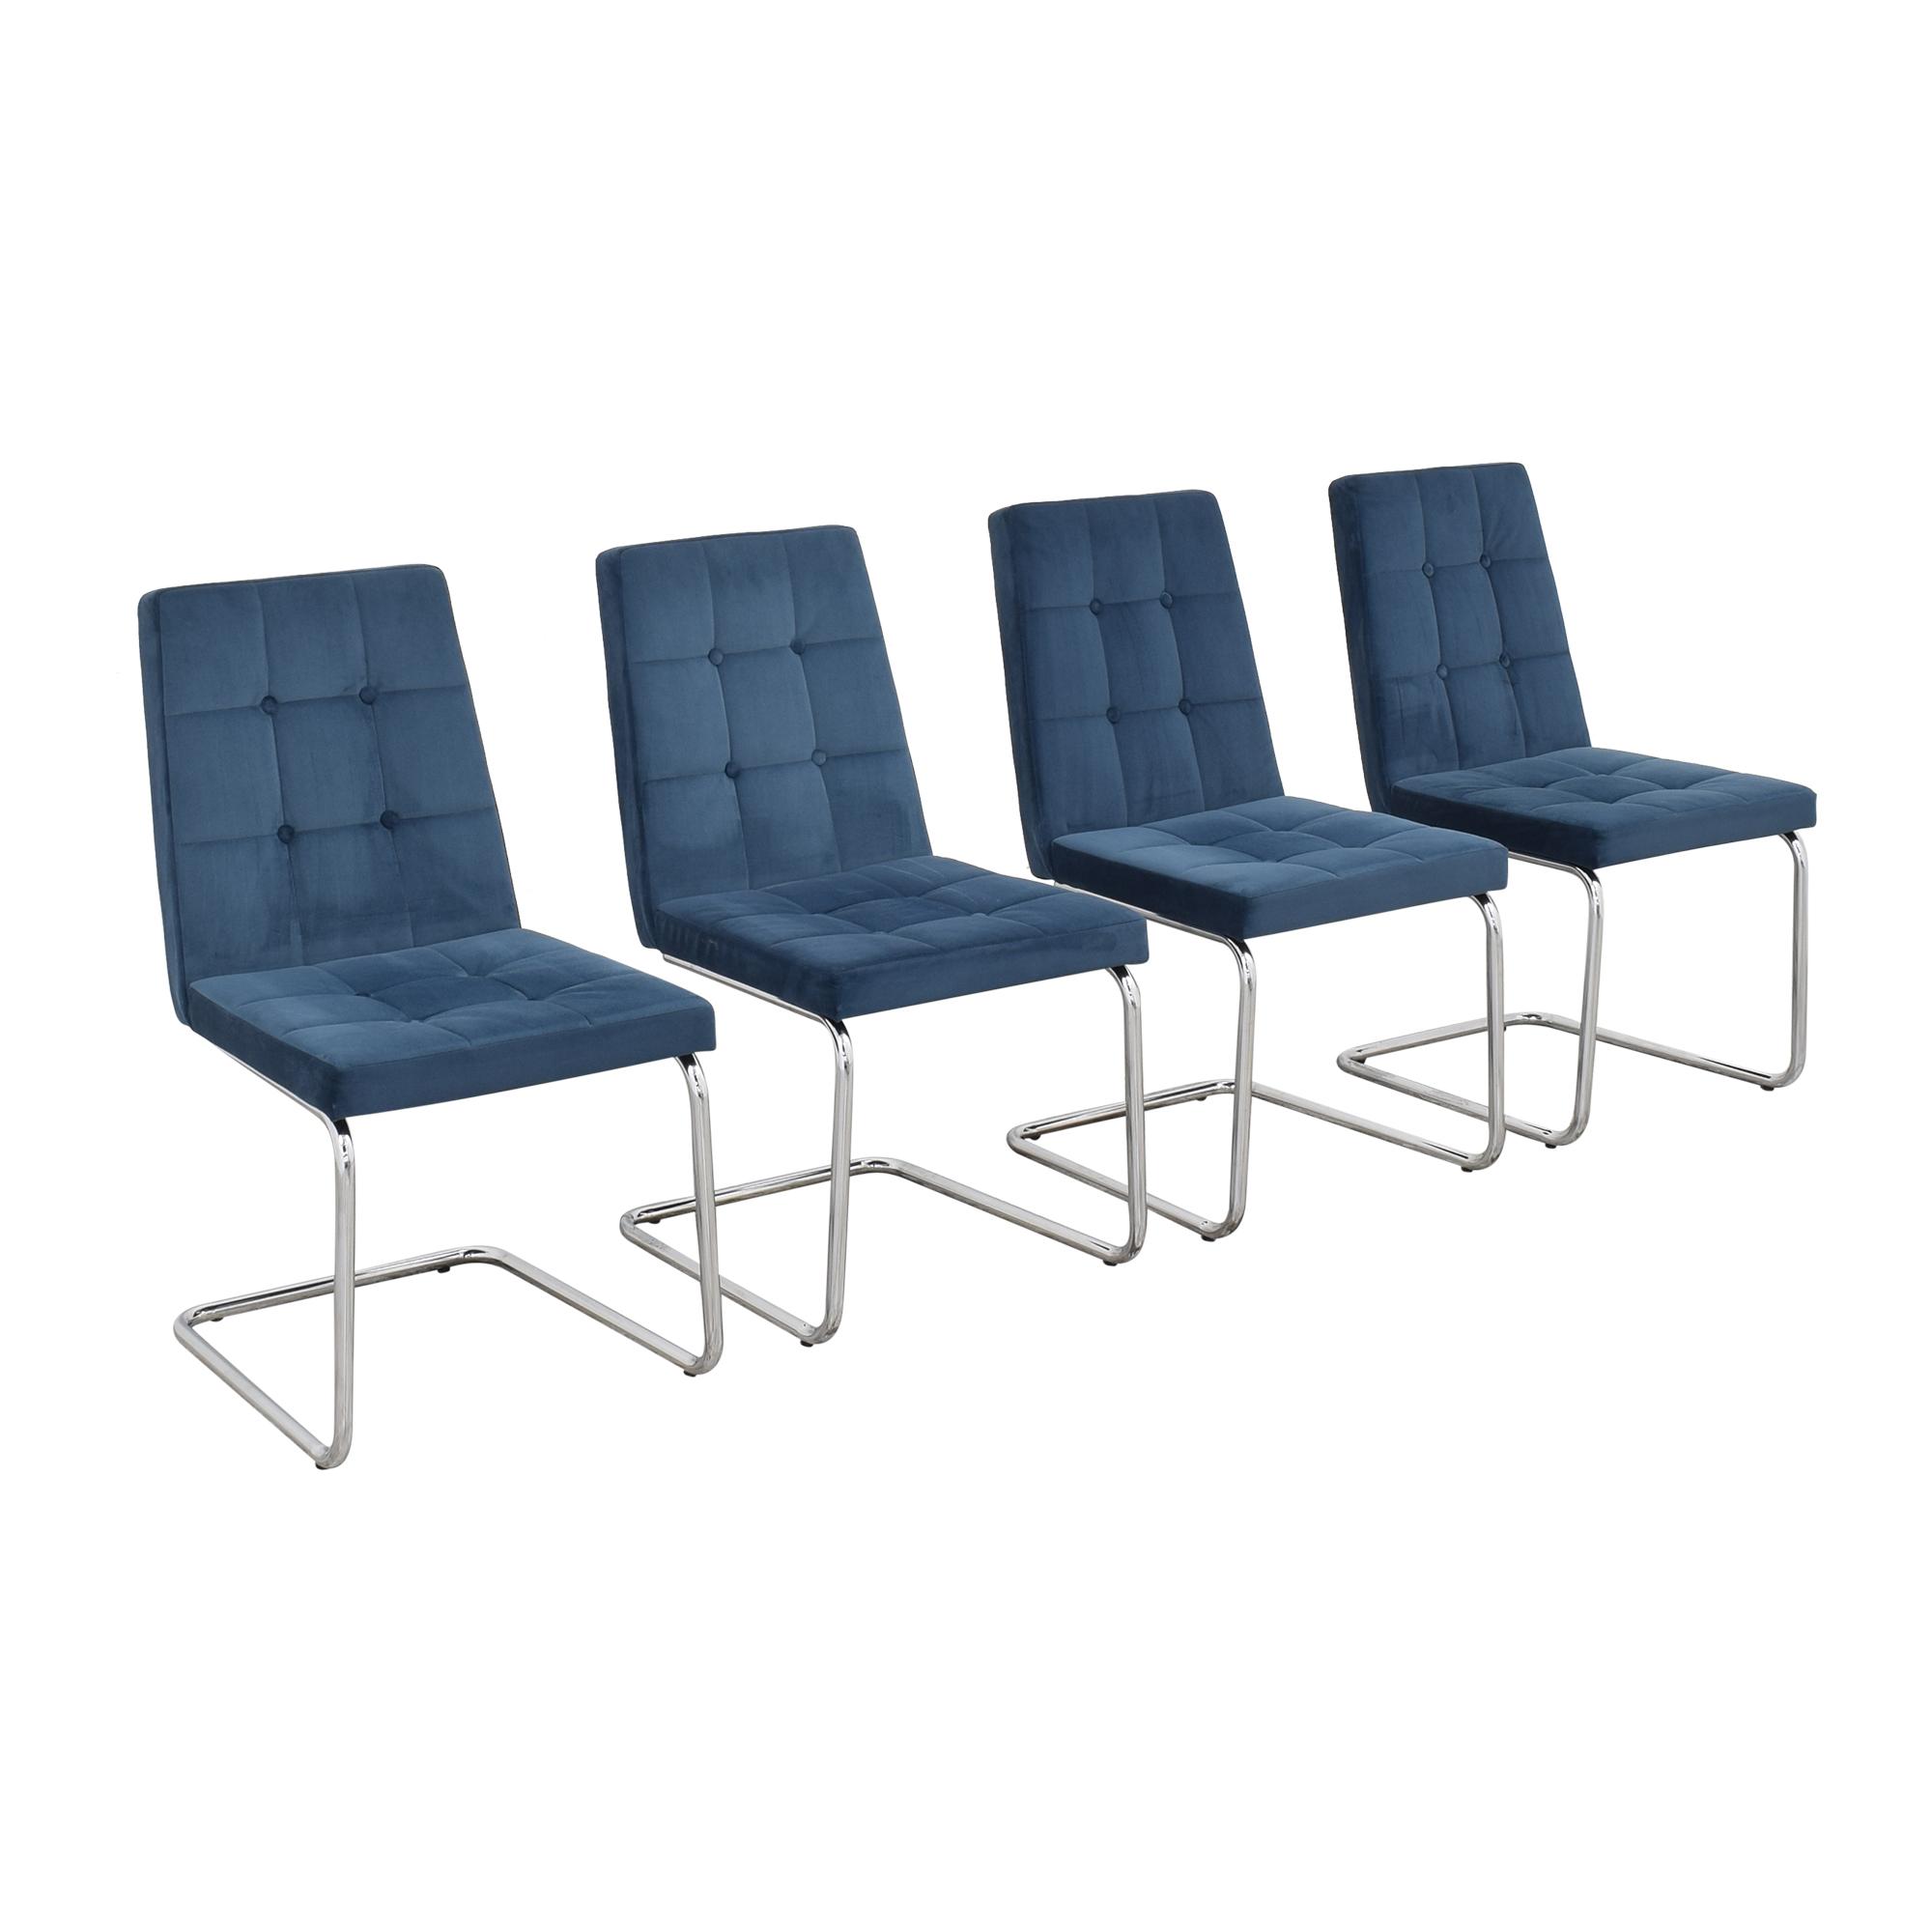 CB2 CB2 Roya Chairs Slate Blue pa